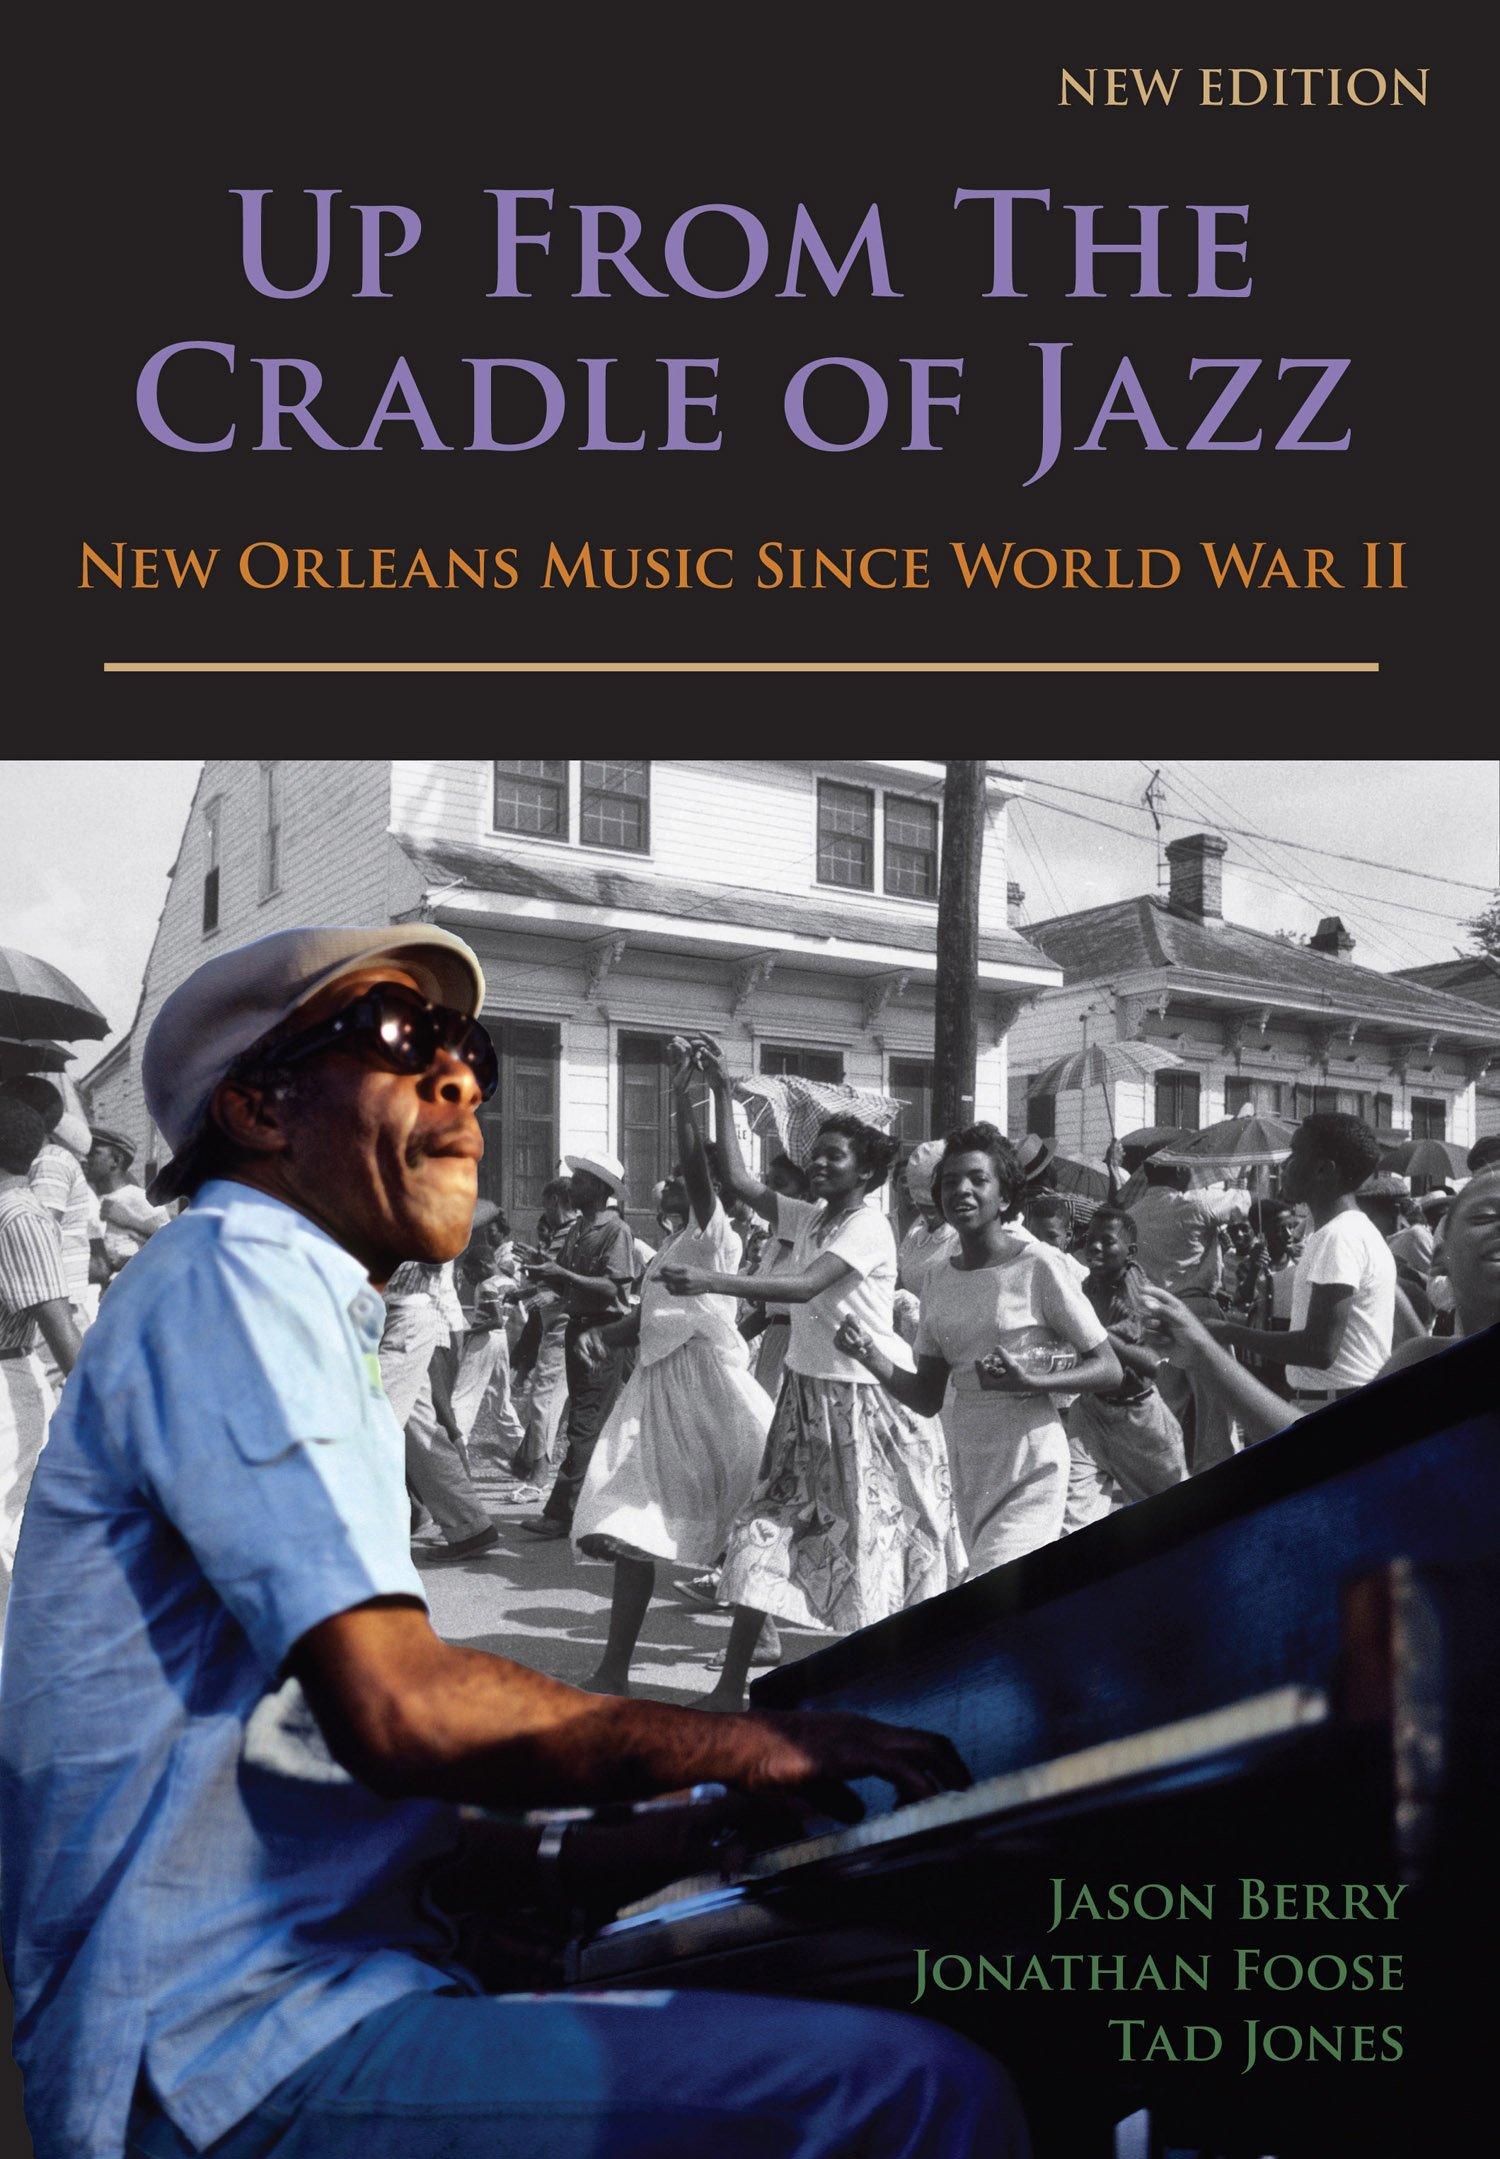 Up from the Cradle of Jazz: New Orleans Music Since World War II: Jason  Berry, Jonathan Foose, Tad Jones: 9781887366878: Amazon.com: Books